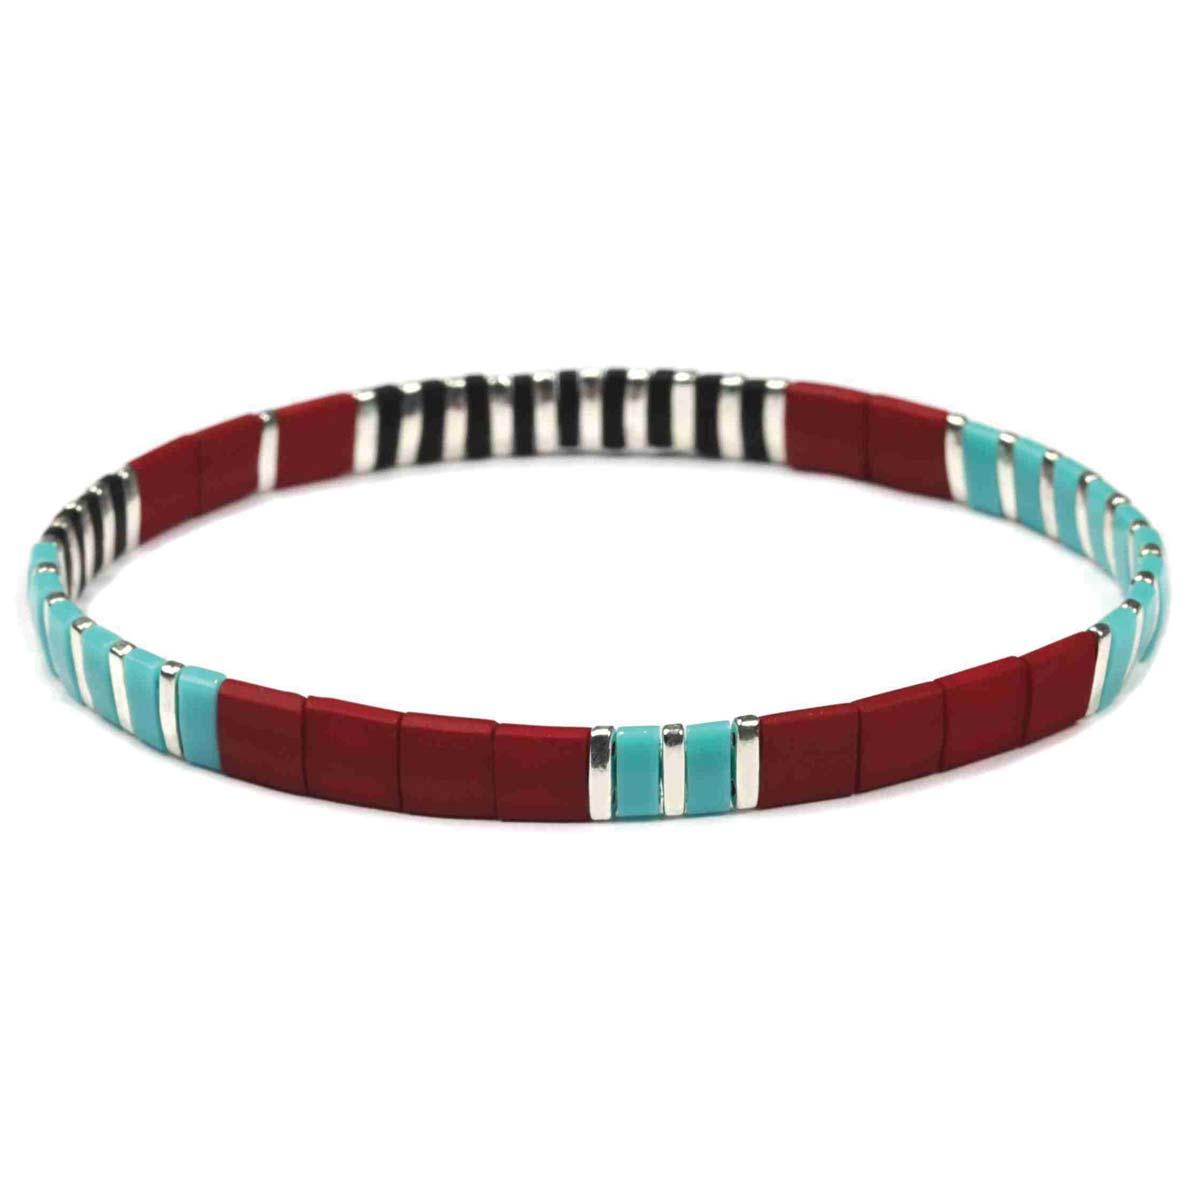 Red, Turquoise, Silver & Black Tila Bead Bracelet